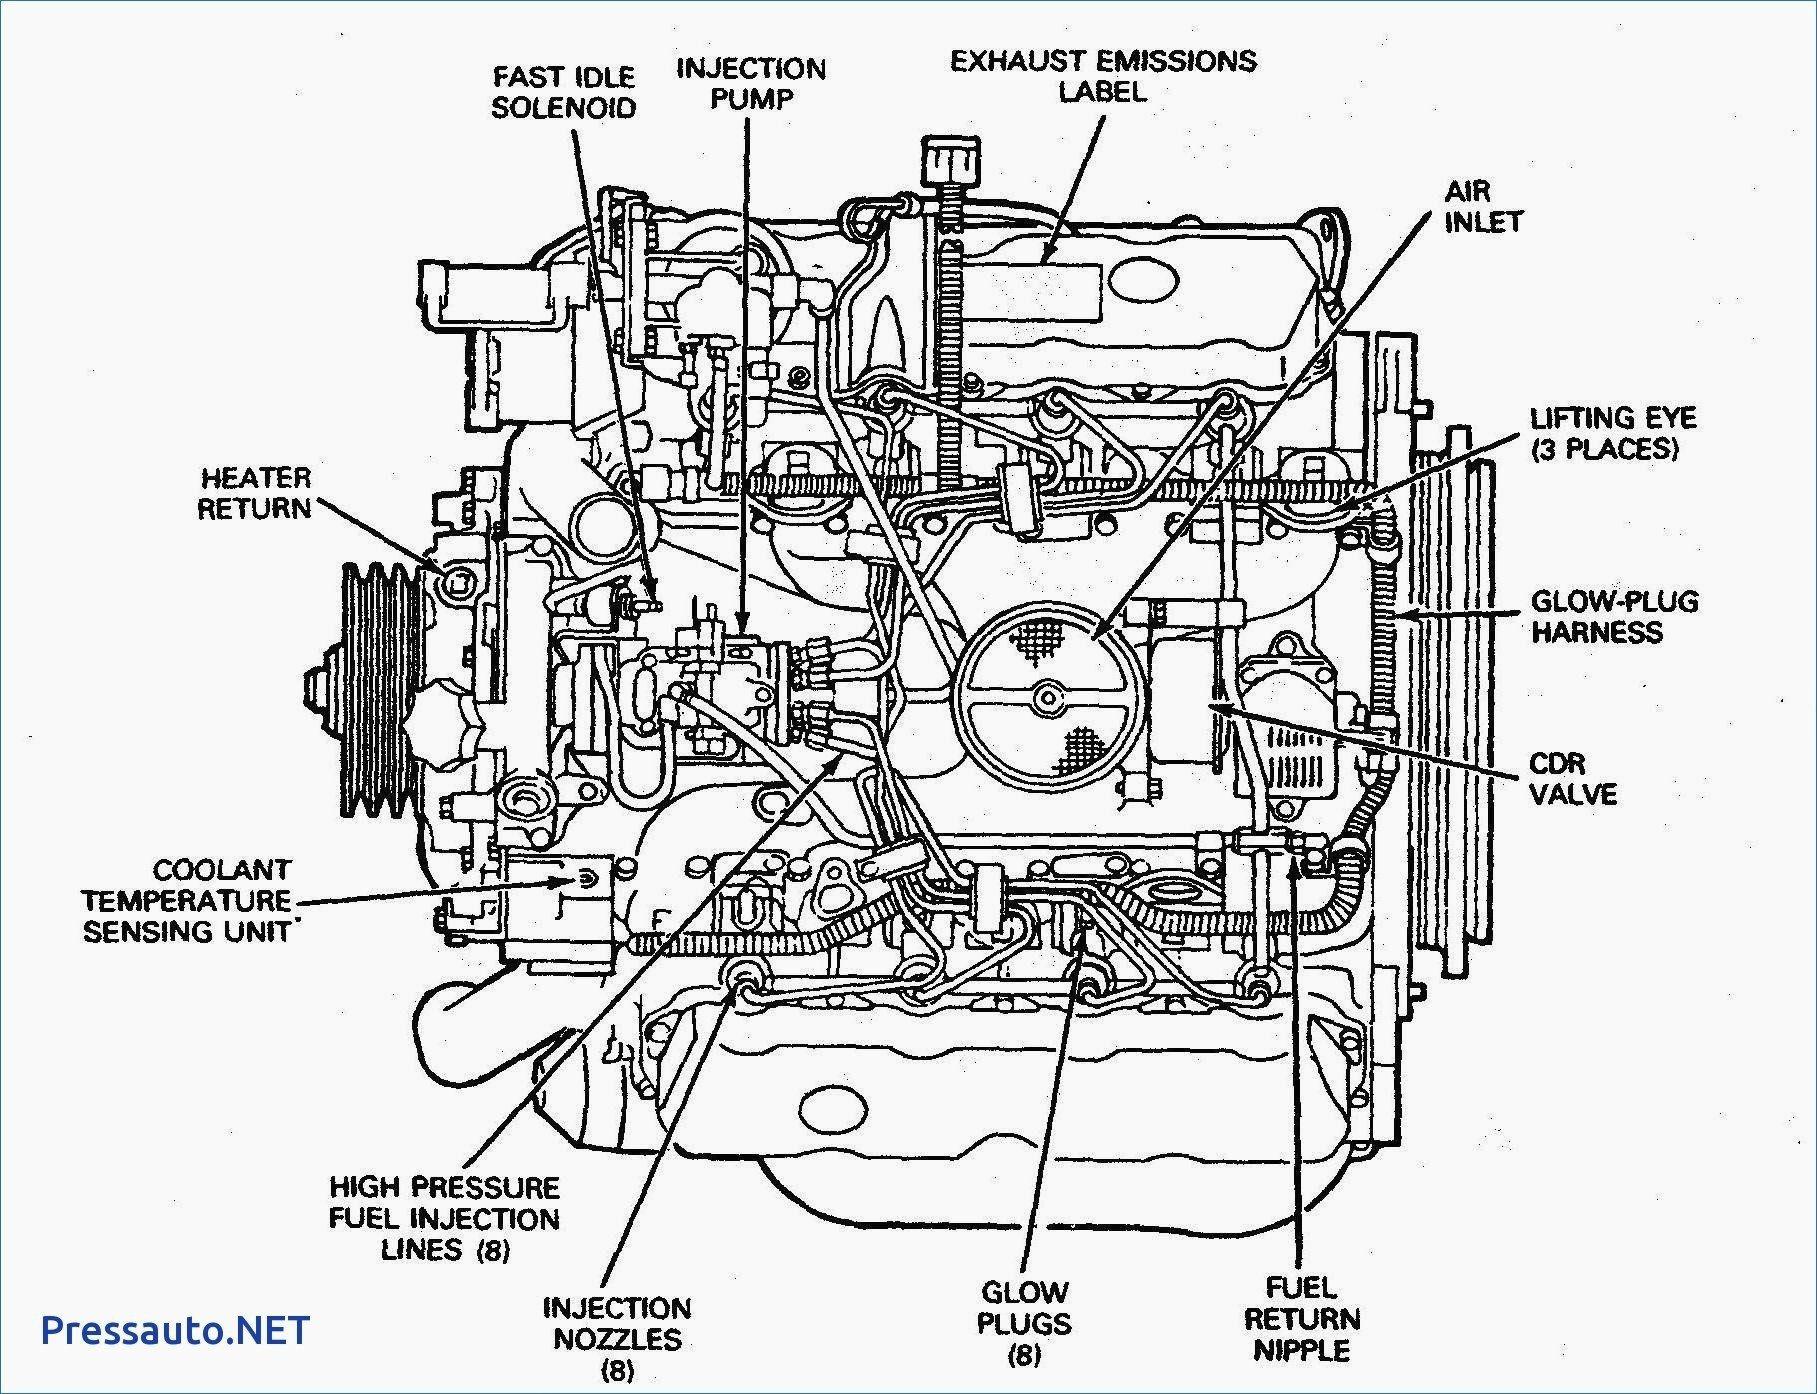 7 3 Glow Plug Wiring Harness - Wire Center • Regarding 7.3 Idi Glow - 7.3 Idi Glow Plug Controller Wiring Diagram